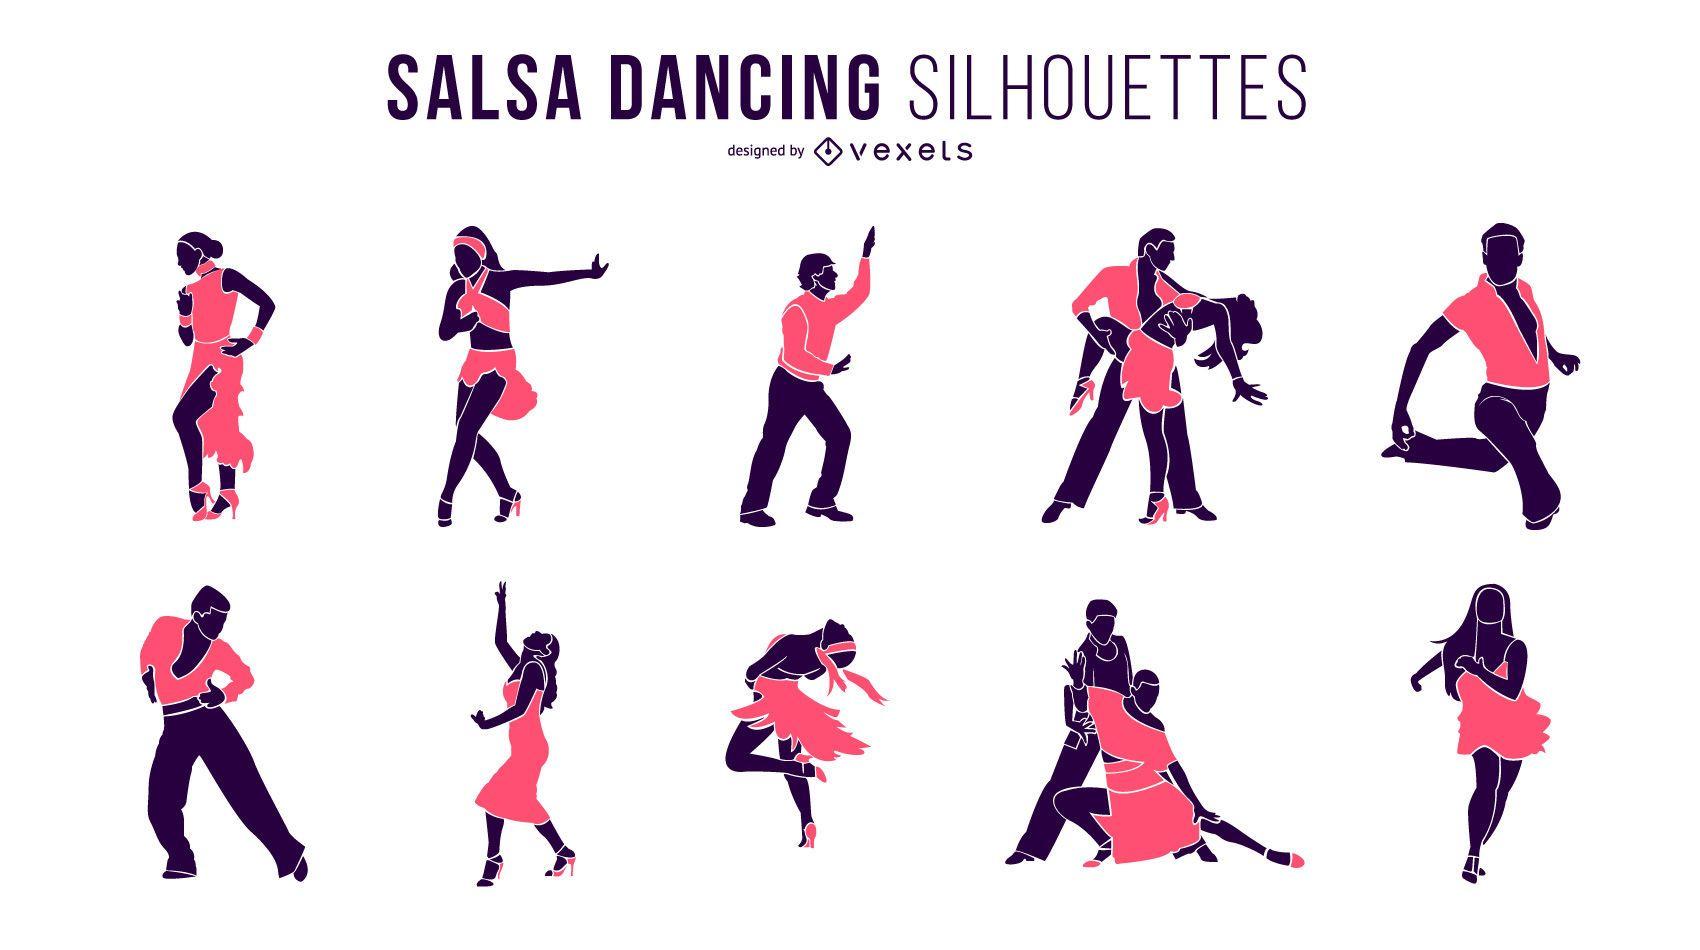 Salsa Dancing Silhouettes